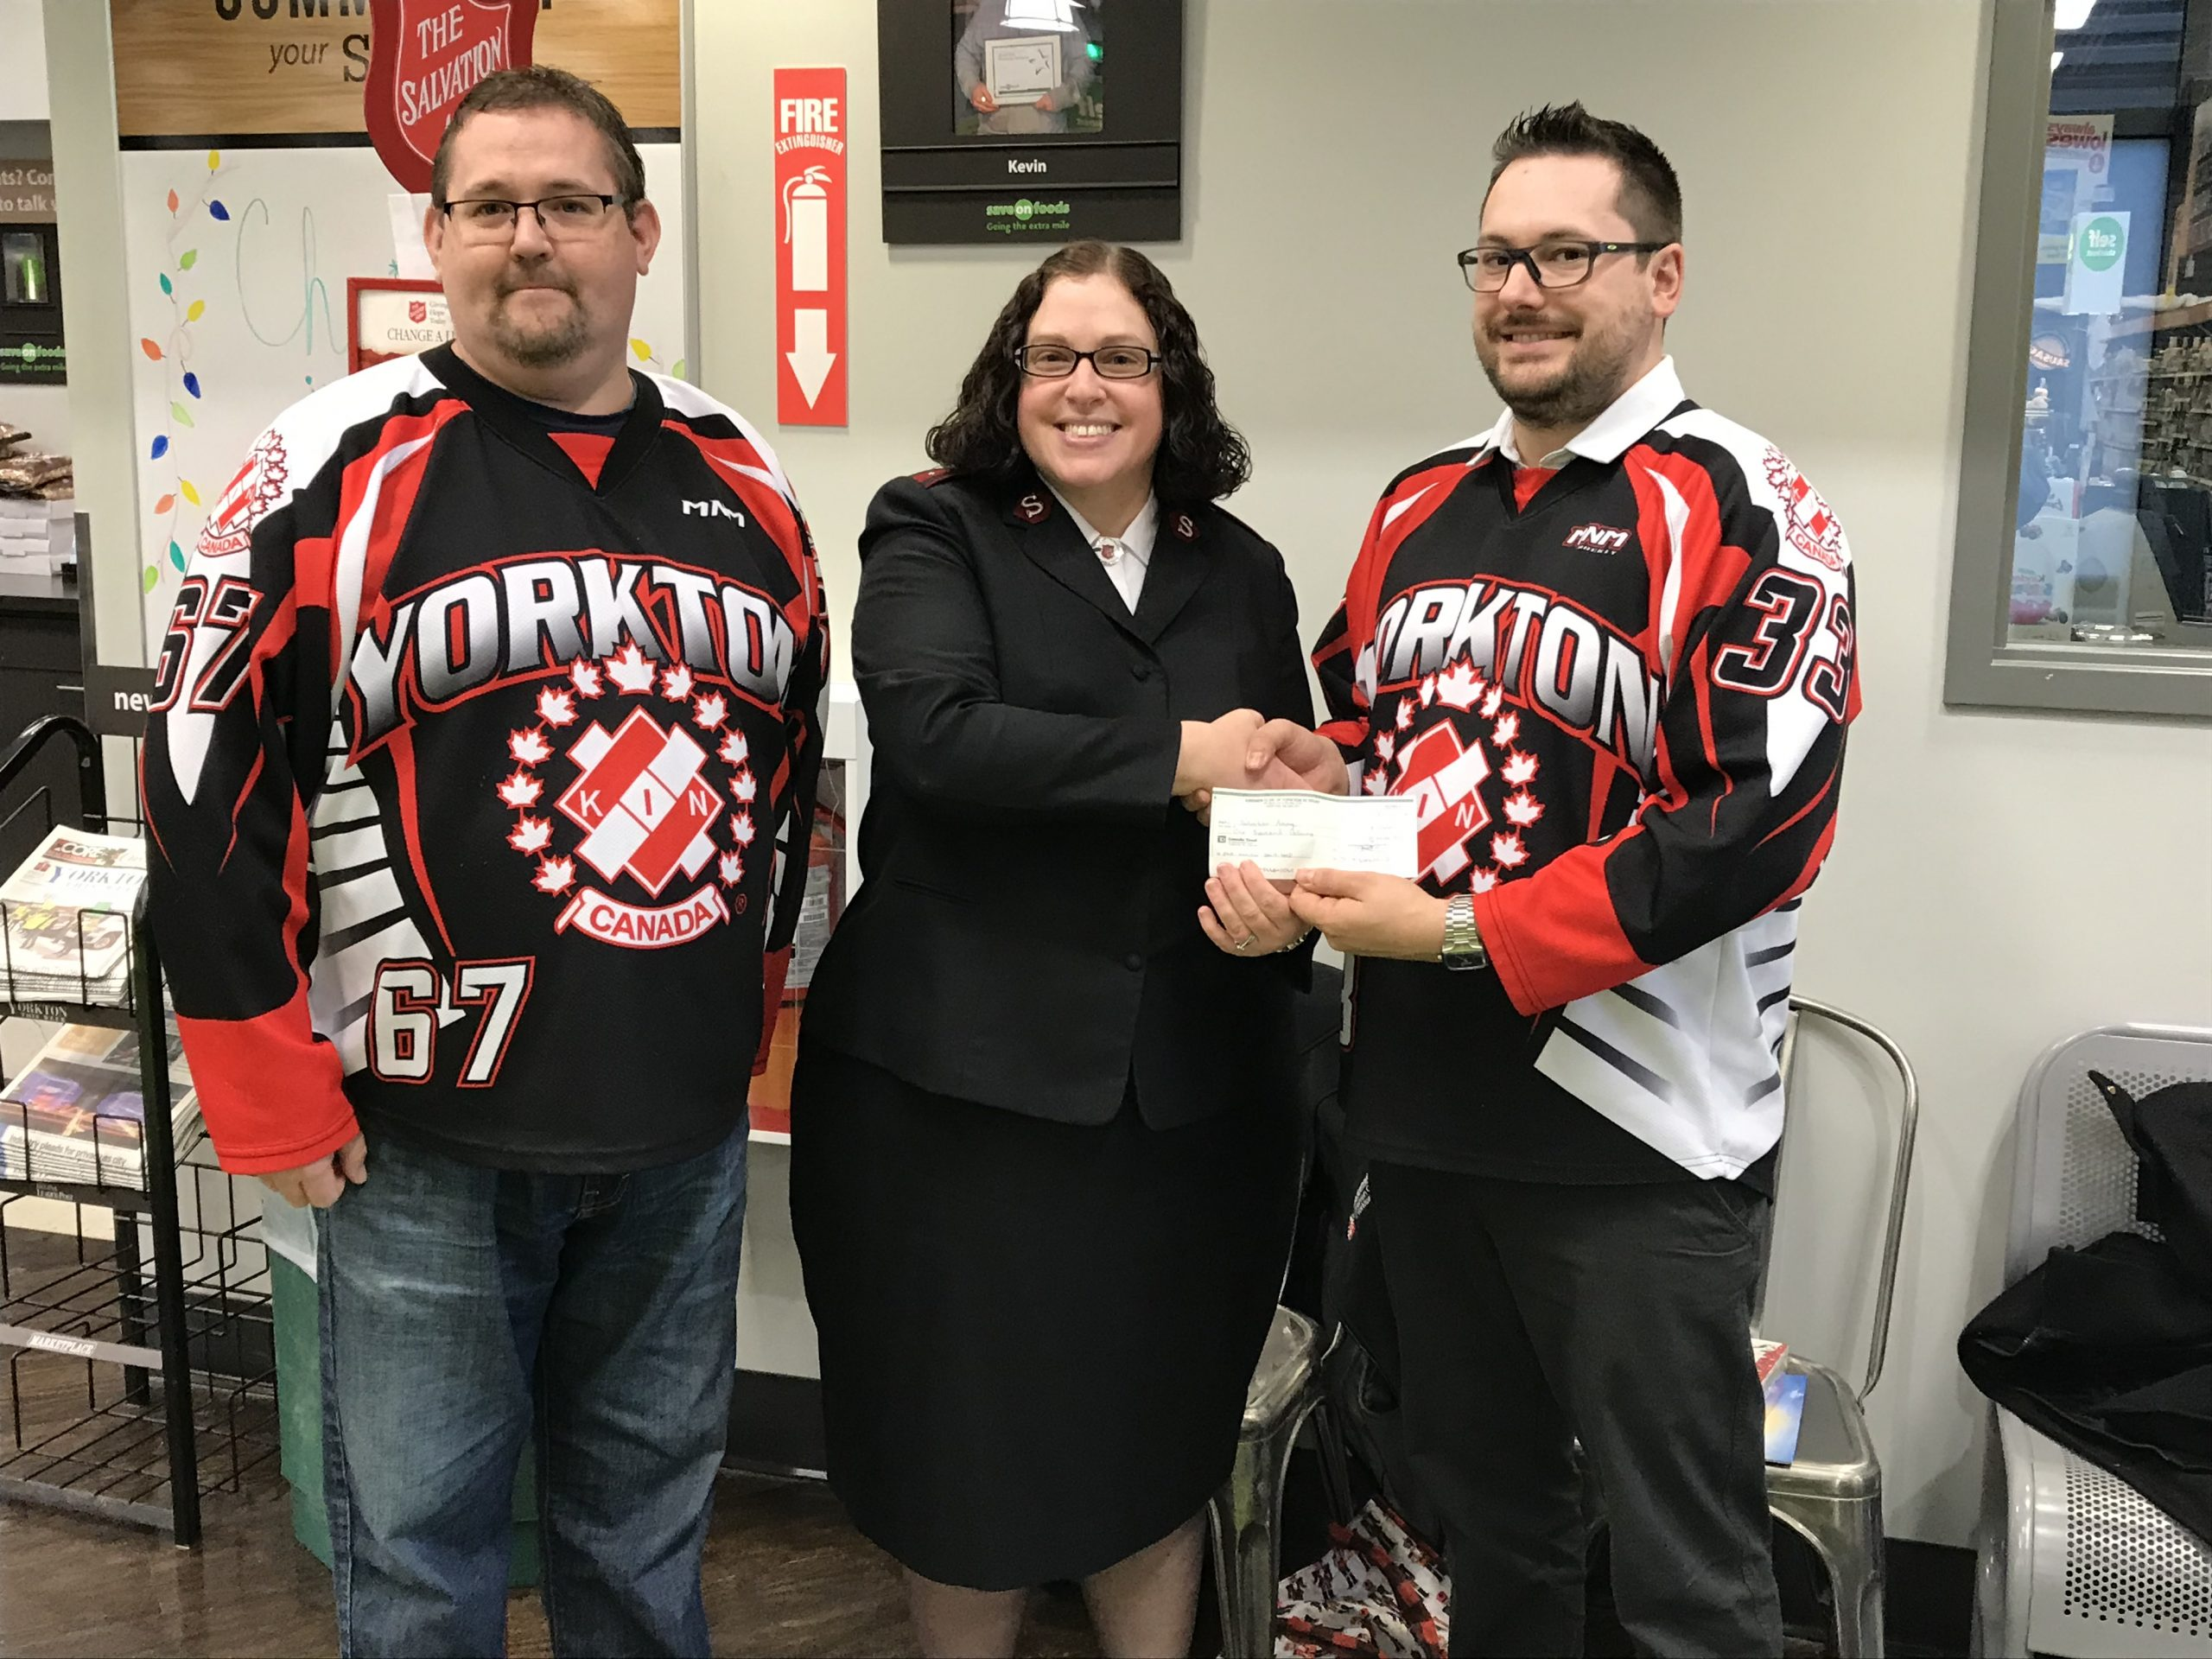 Yorkton Kinsmen Donate to Salvation Army